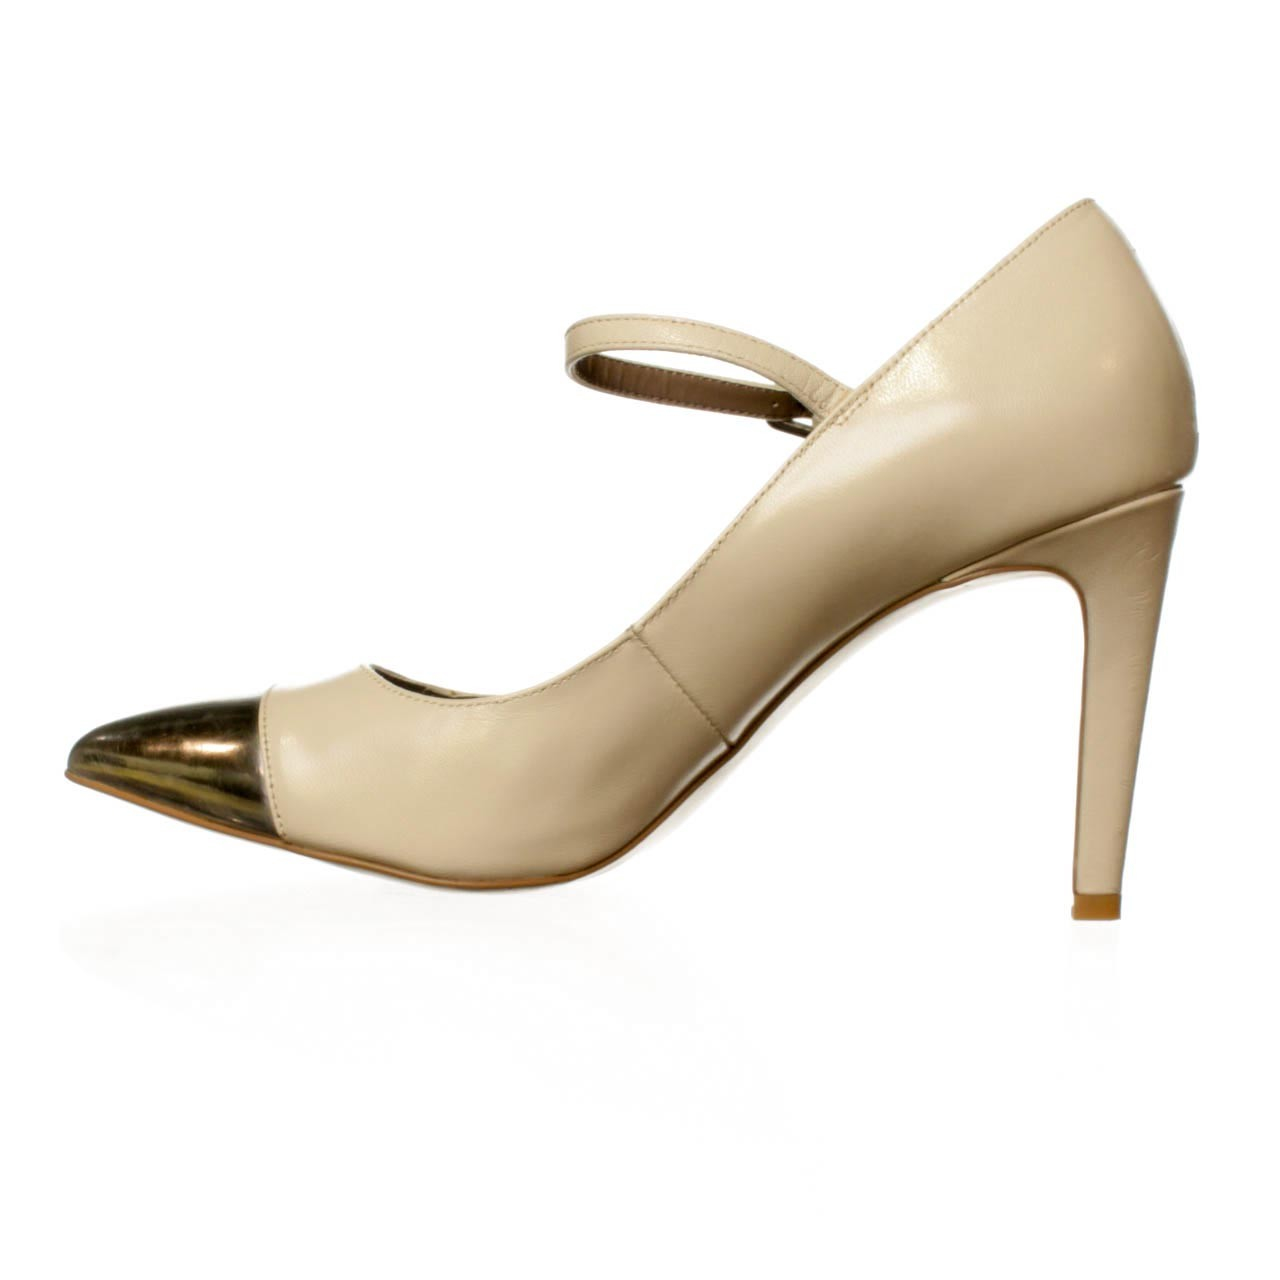 jensen shoes jane kravitzs Shoes sport hi, my name is elena  kravitzs@ nphirkrakr@ mzlyh@ nprofsrbill@ nlun@  nlucy-jane@ nrafael8518@ stir02@ nnn55@ npopsloppyg.